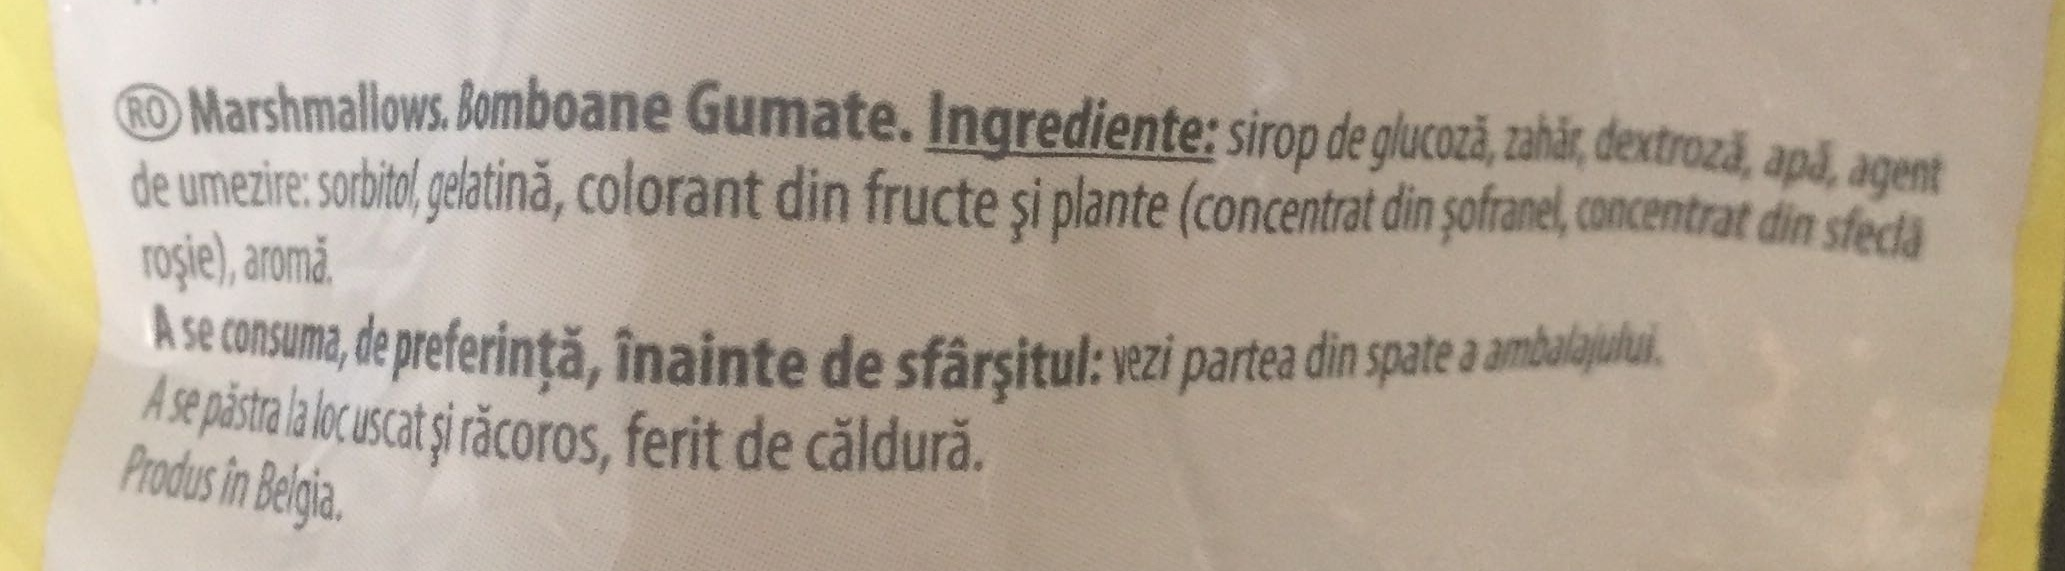 Mallows - Ingrédients